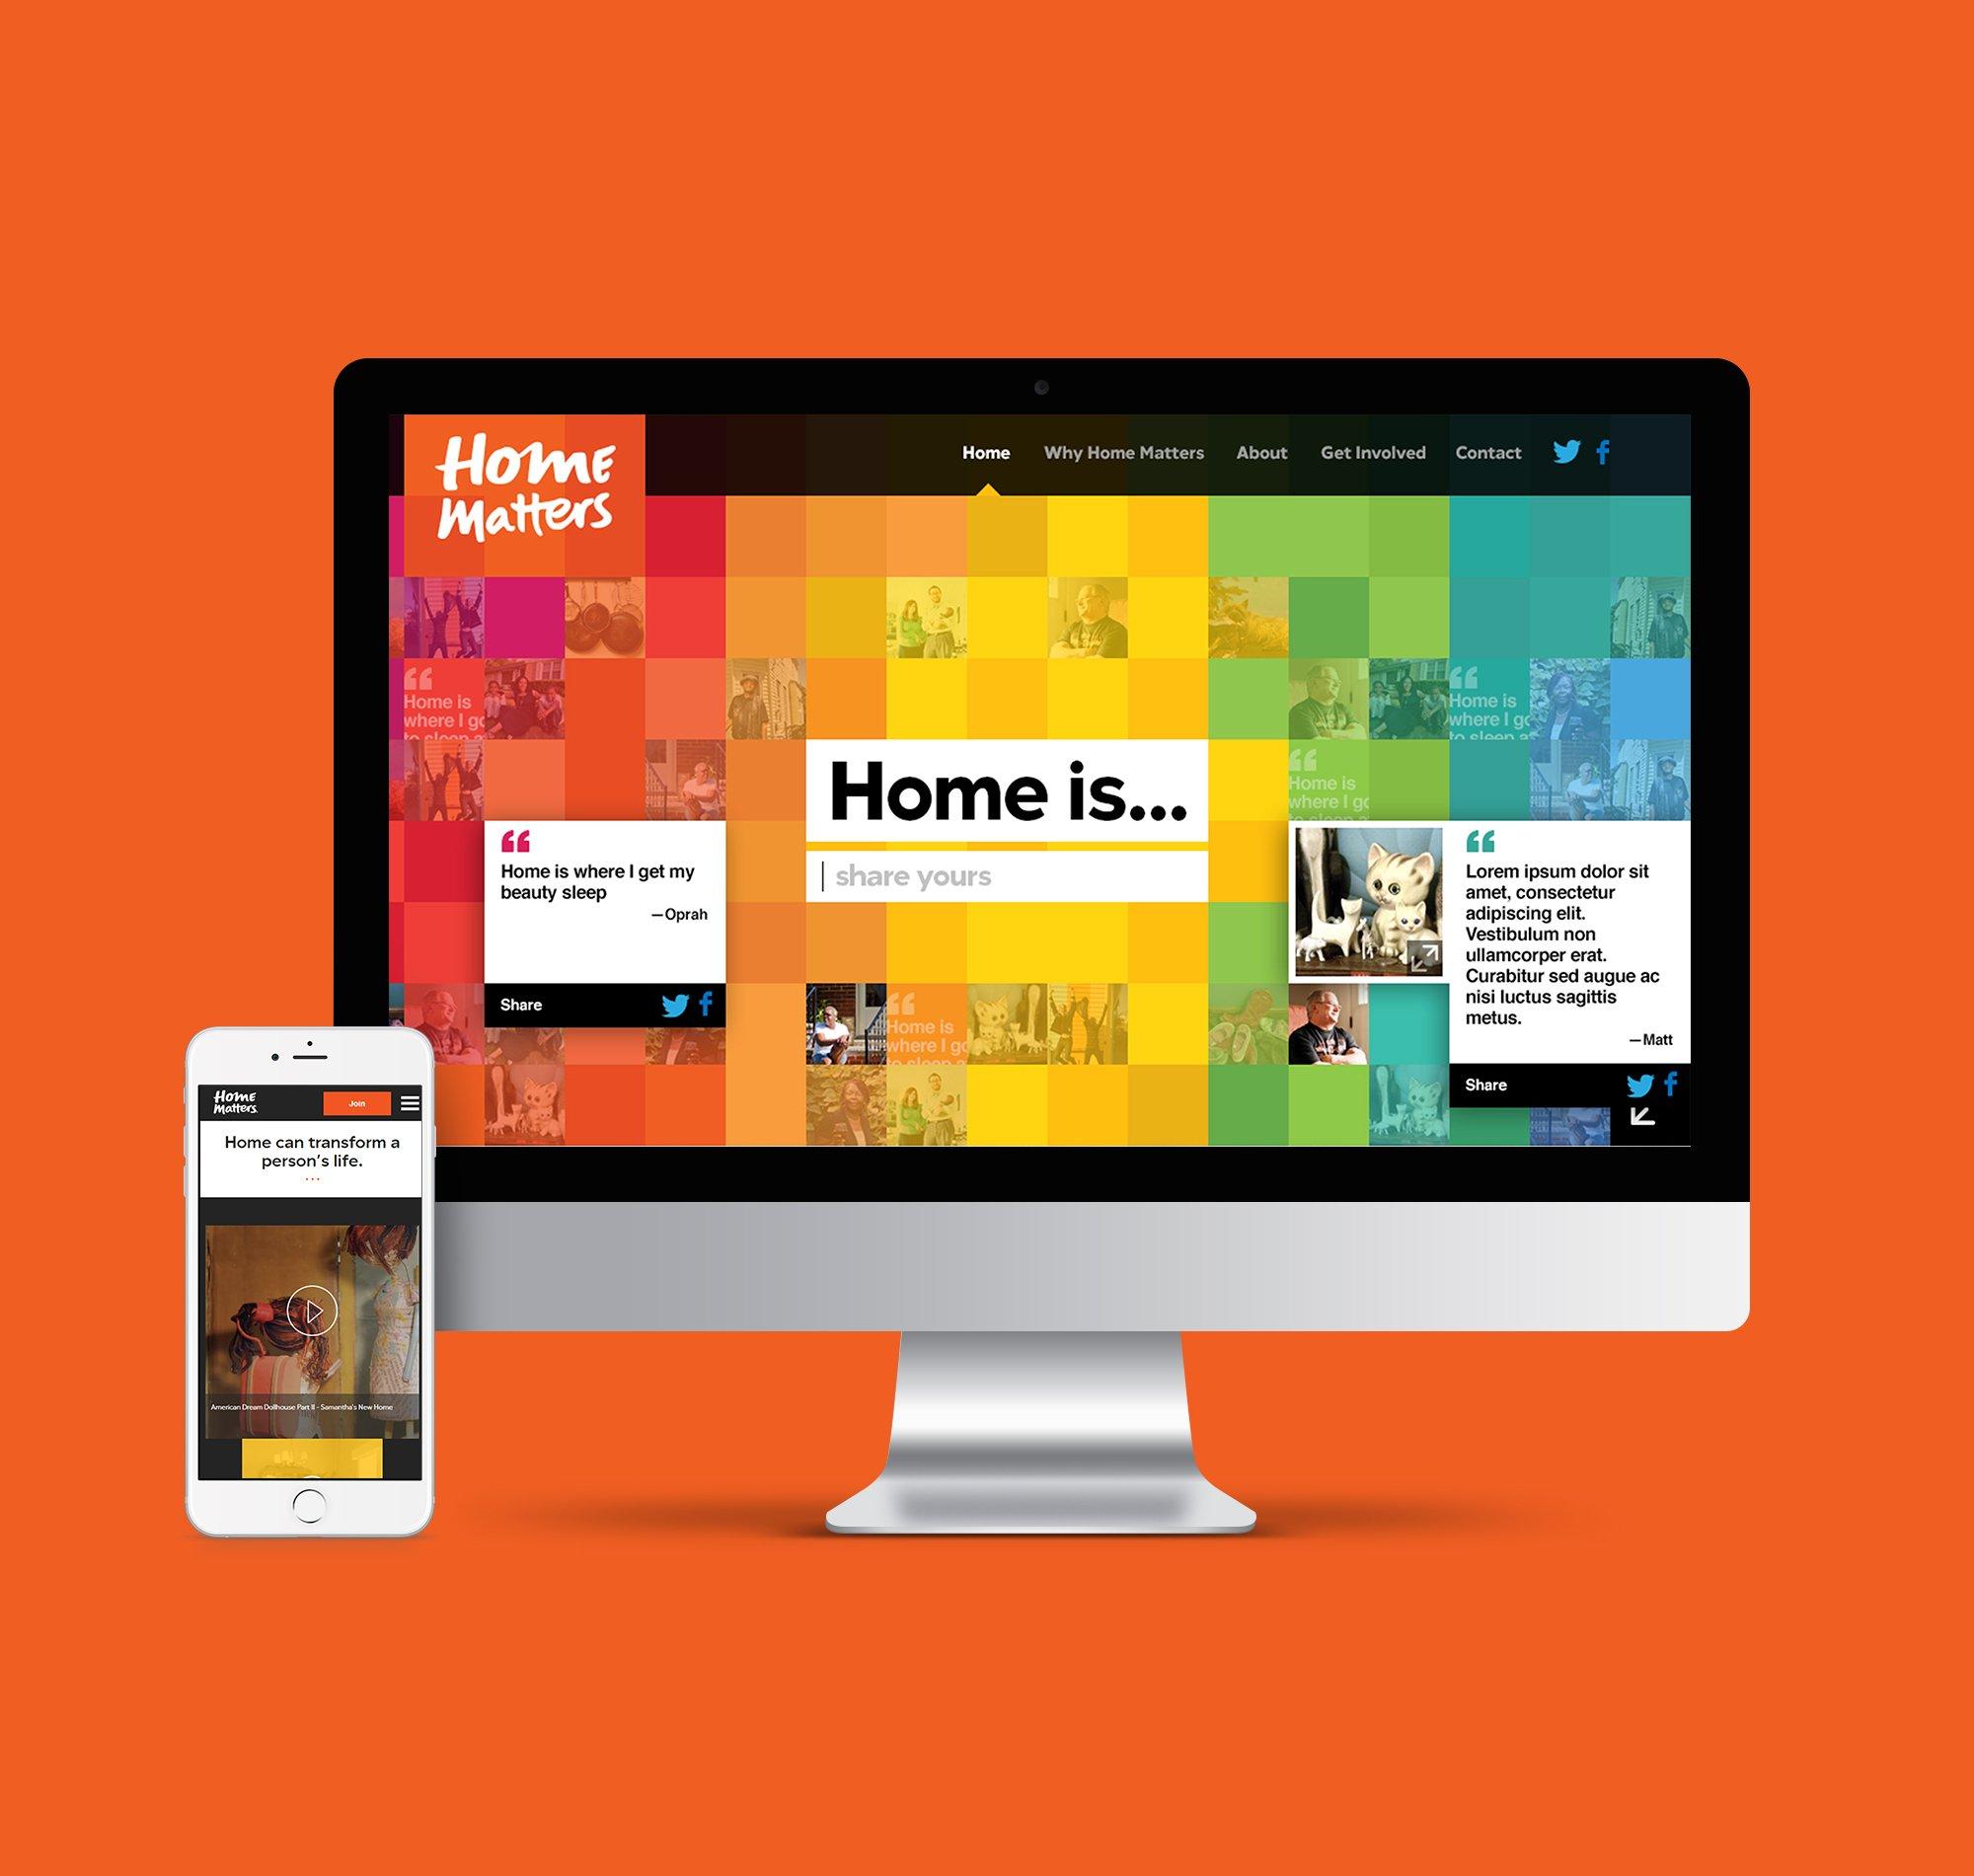 Home Matters website